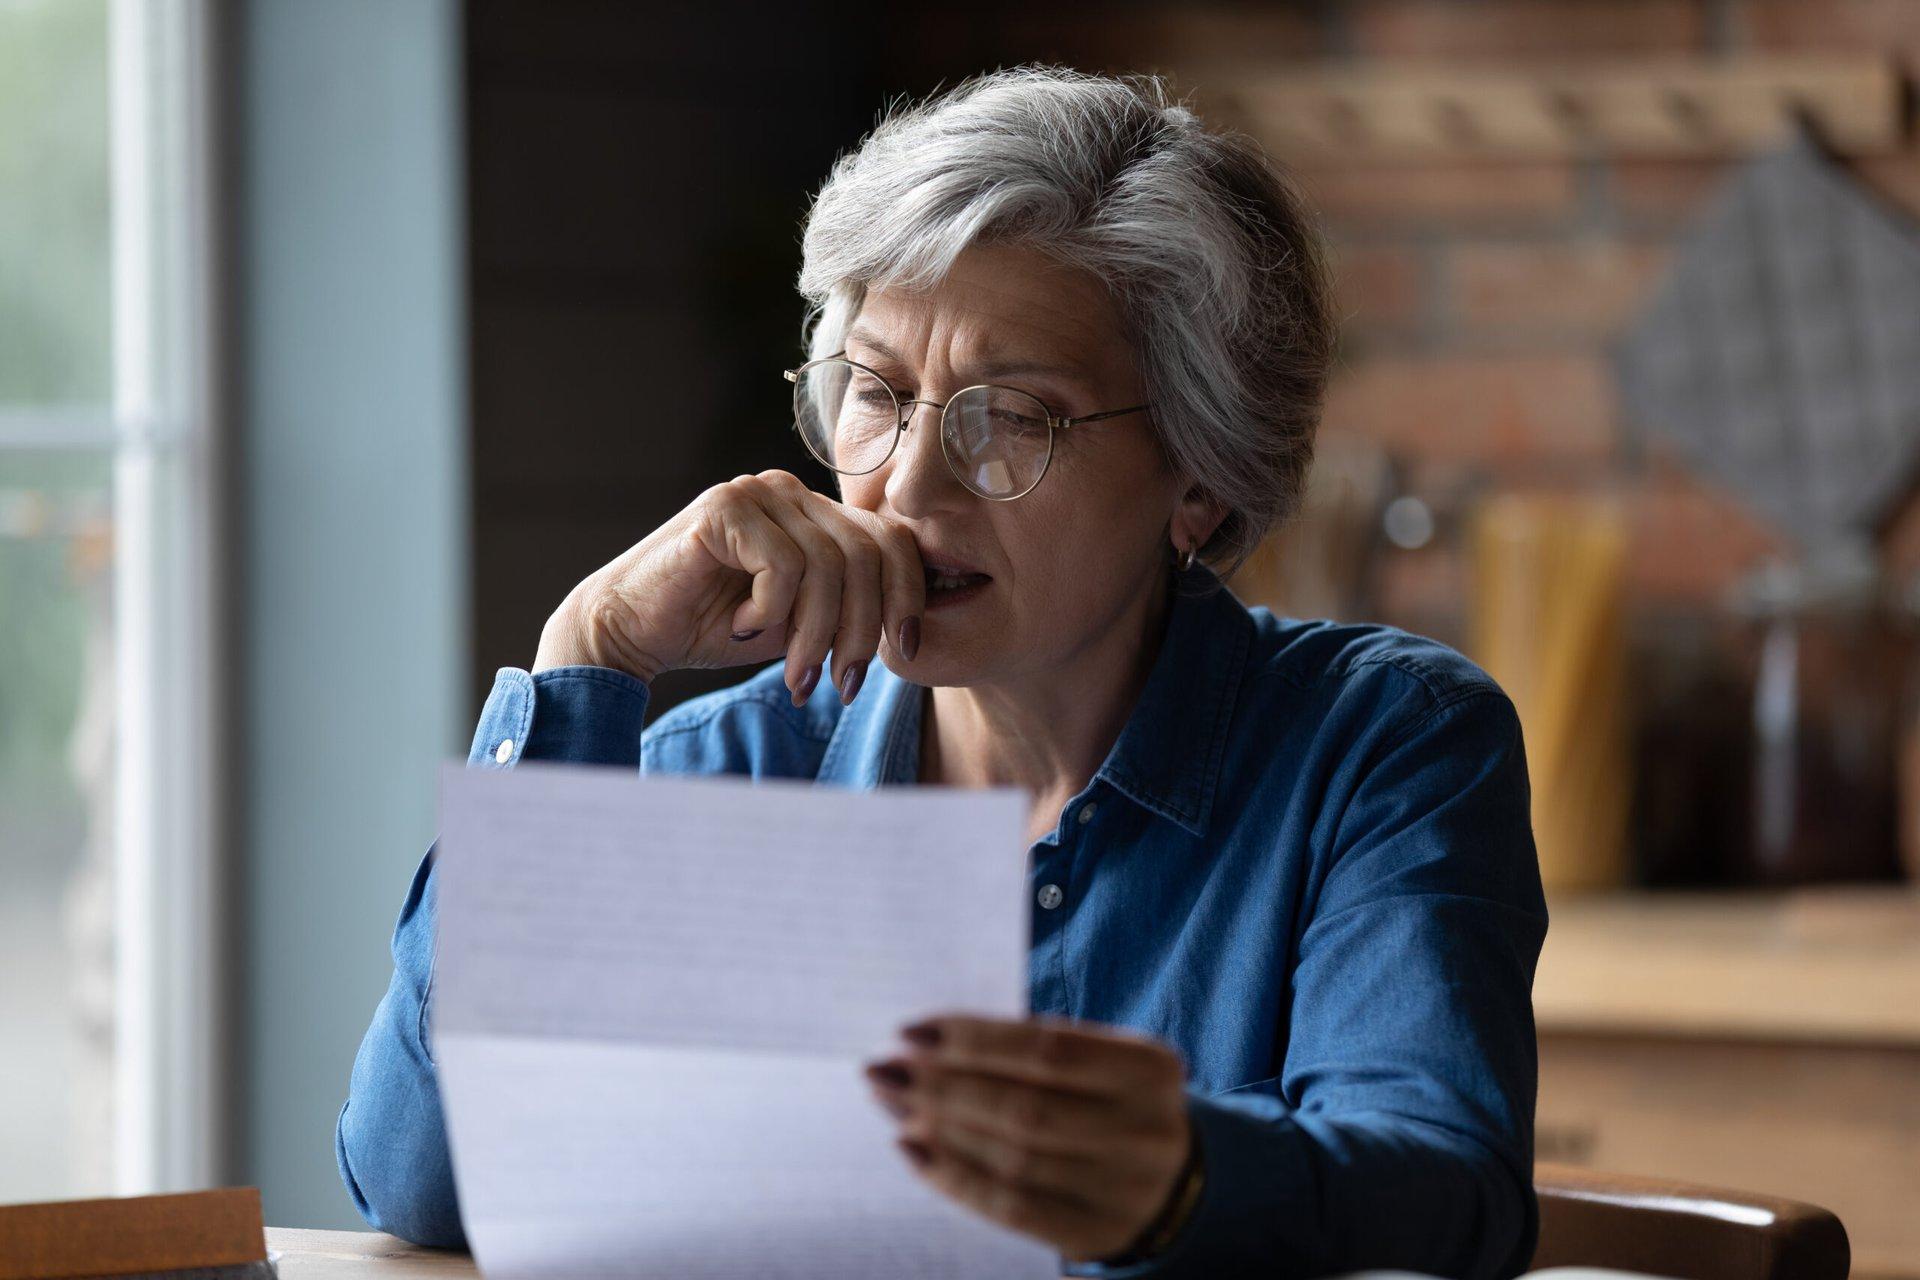 Upset senior holding a financial document